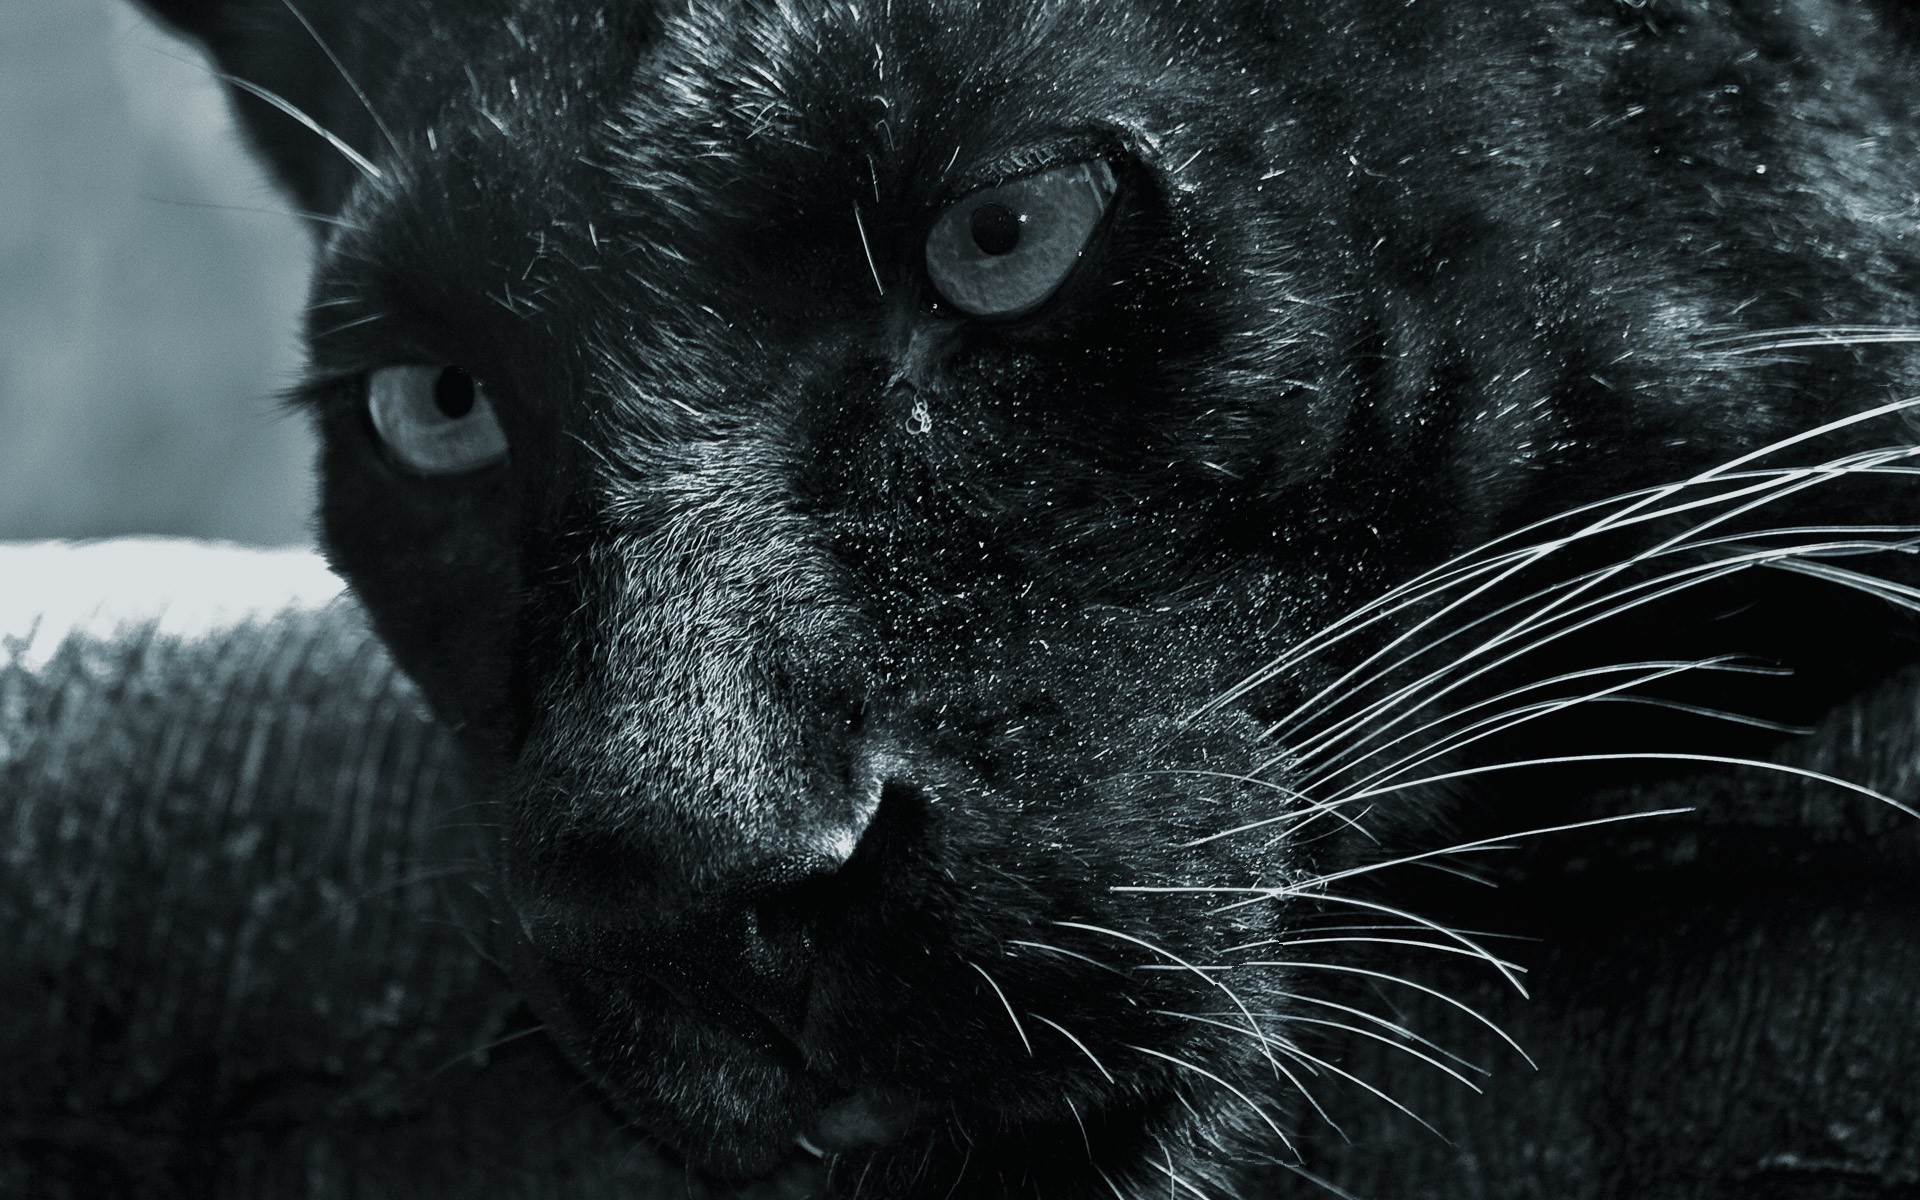 stunning animal close up wallpaper 37570